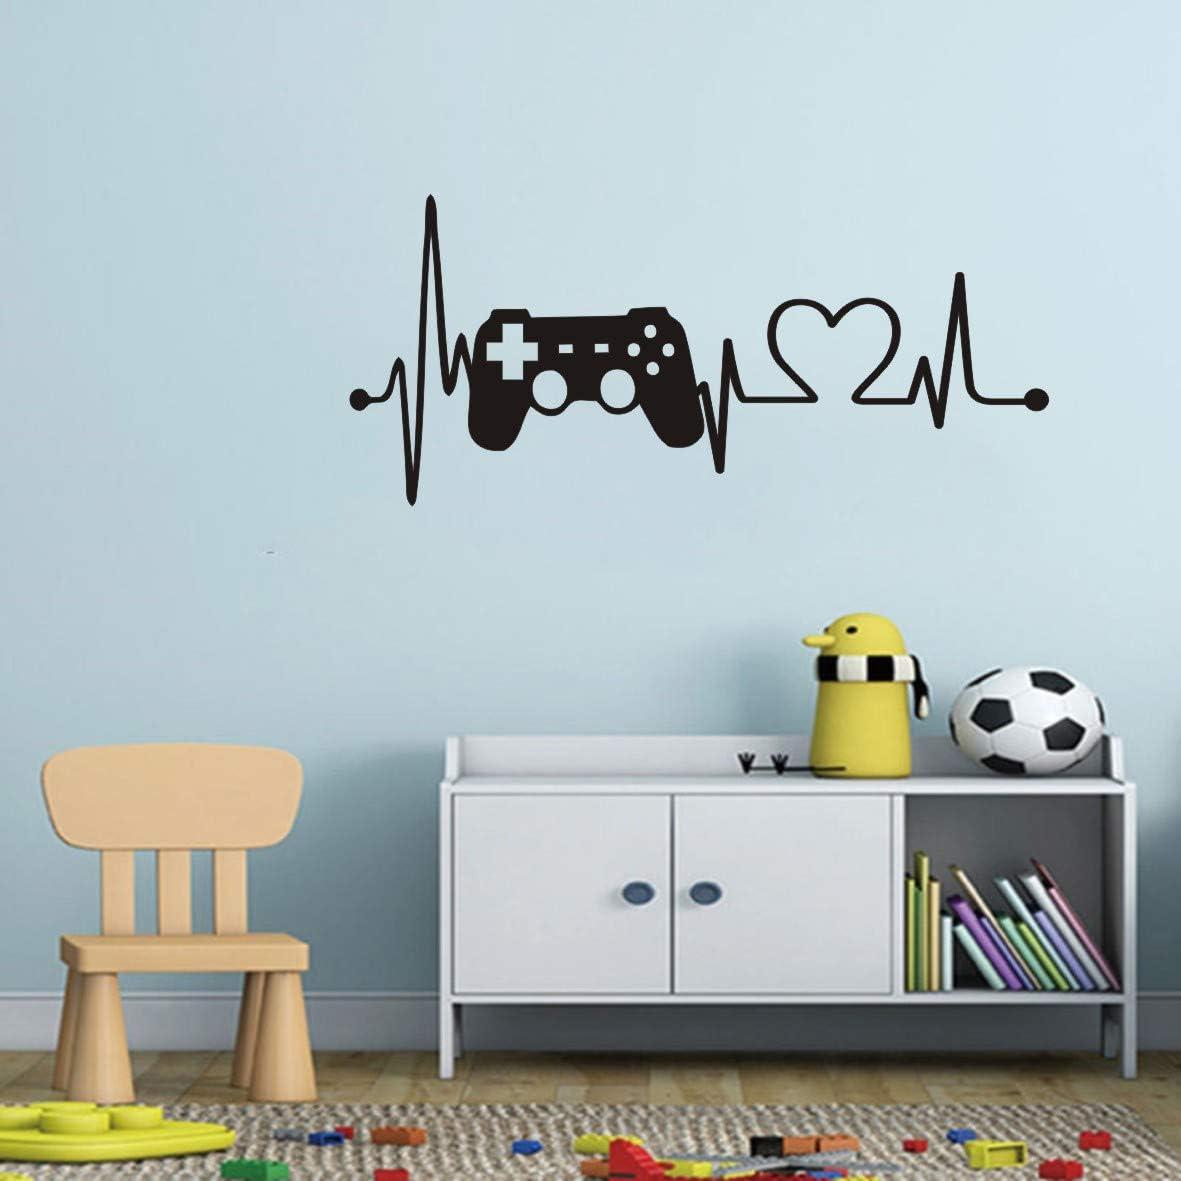 Gaming Wall Sticker Art Boys Room Video Game Controller Wall Decor Gamer Gamepad Electrocardiogram Vinyl Wall Decal DW6214-1 (Black, 42x95cm)